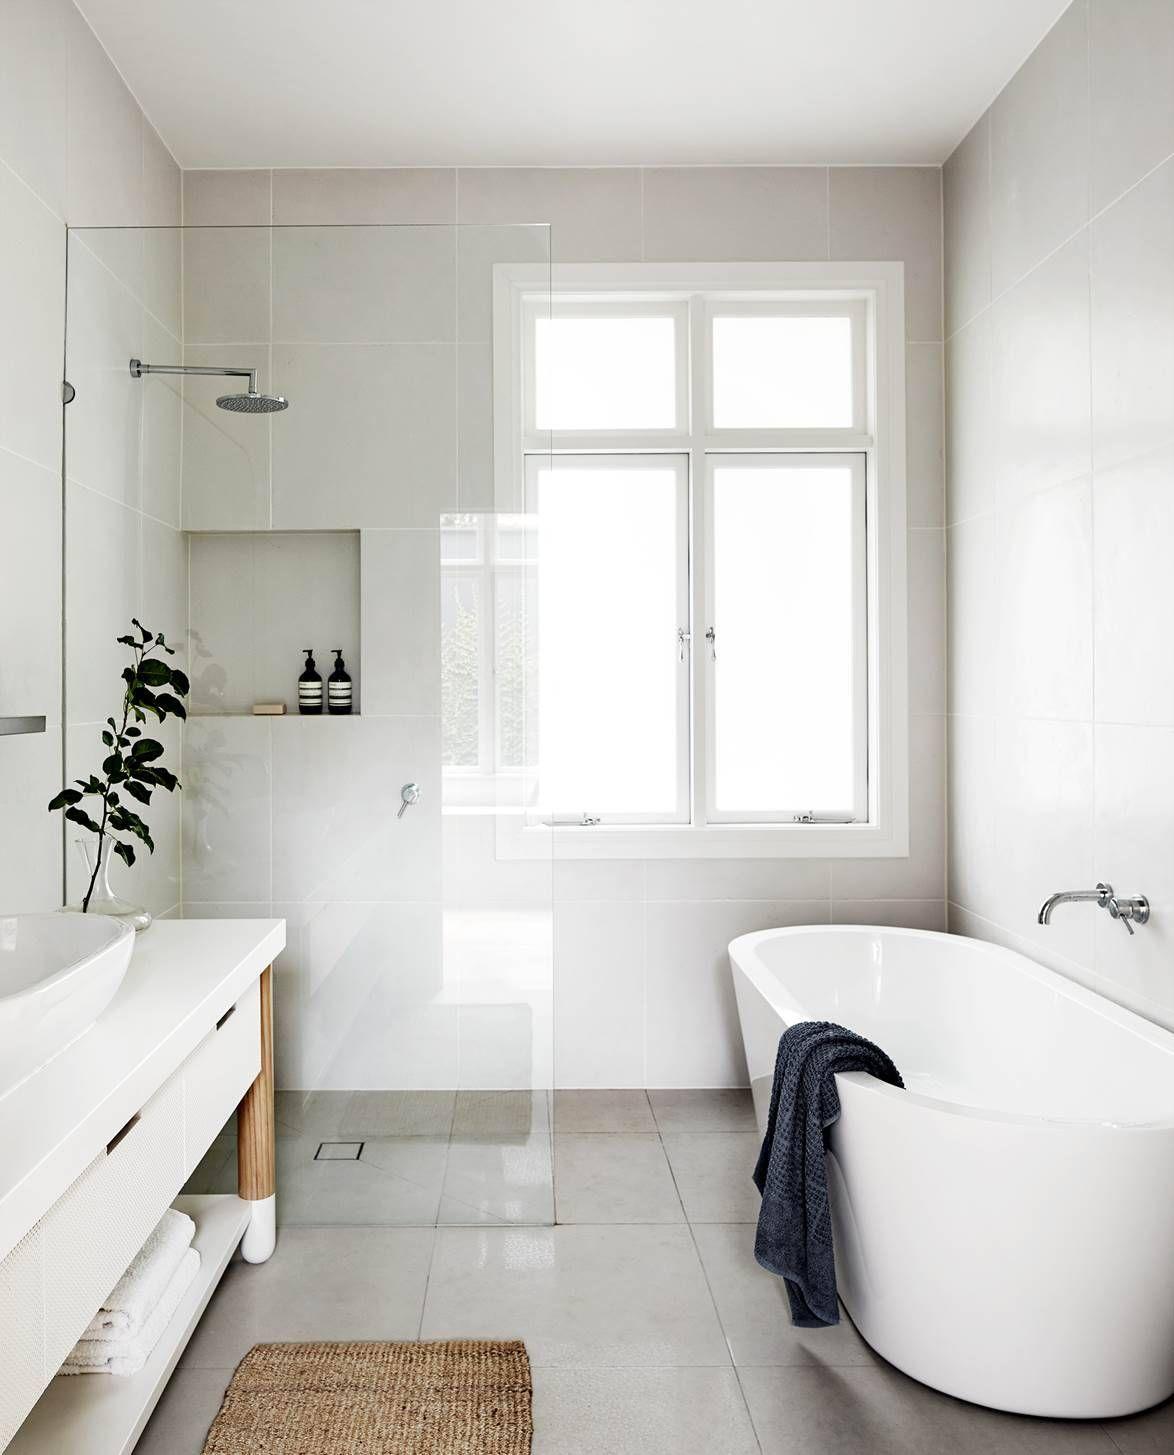 glas #douchewand #wit #badkamer #vrijstaand #bad - Badkamer ...